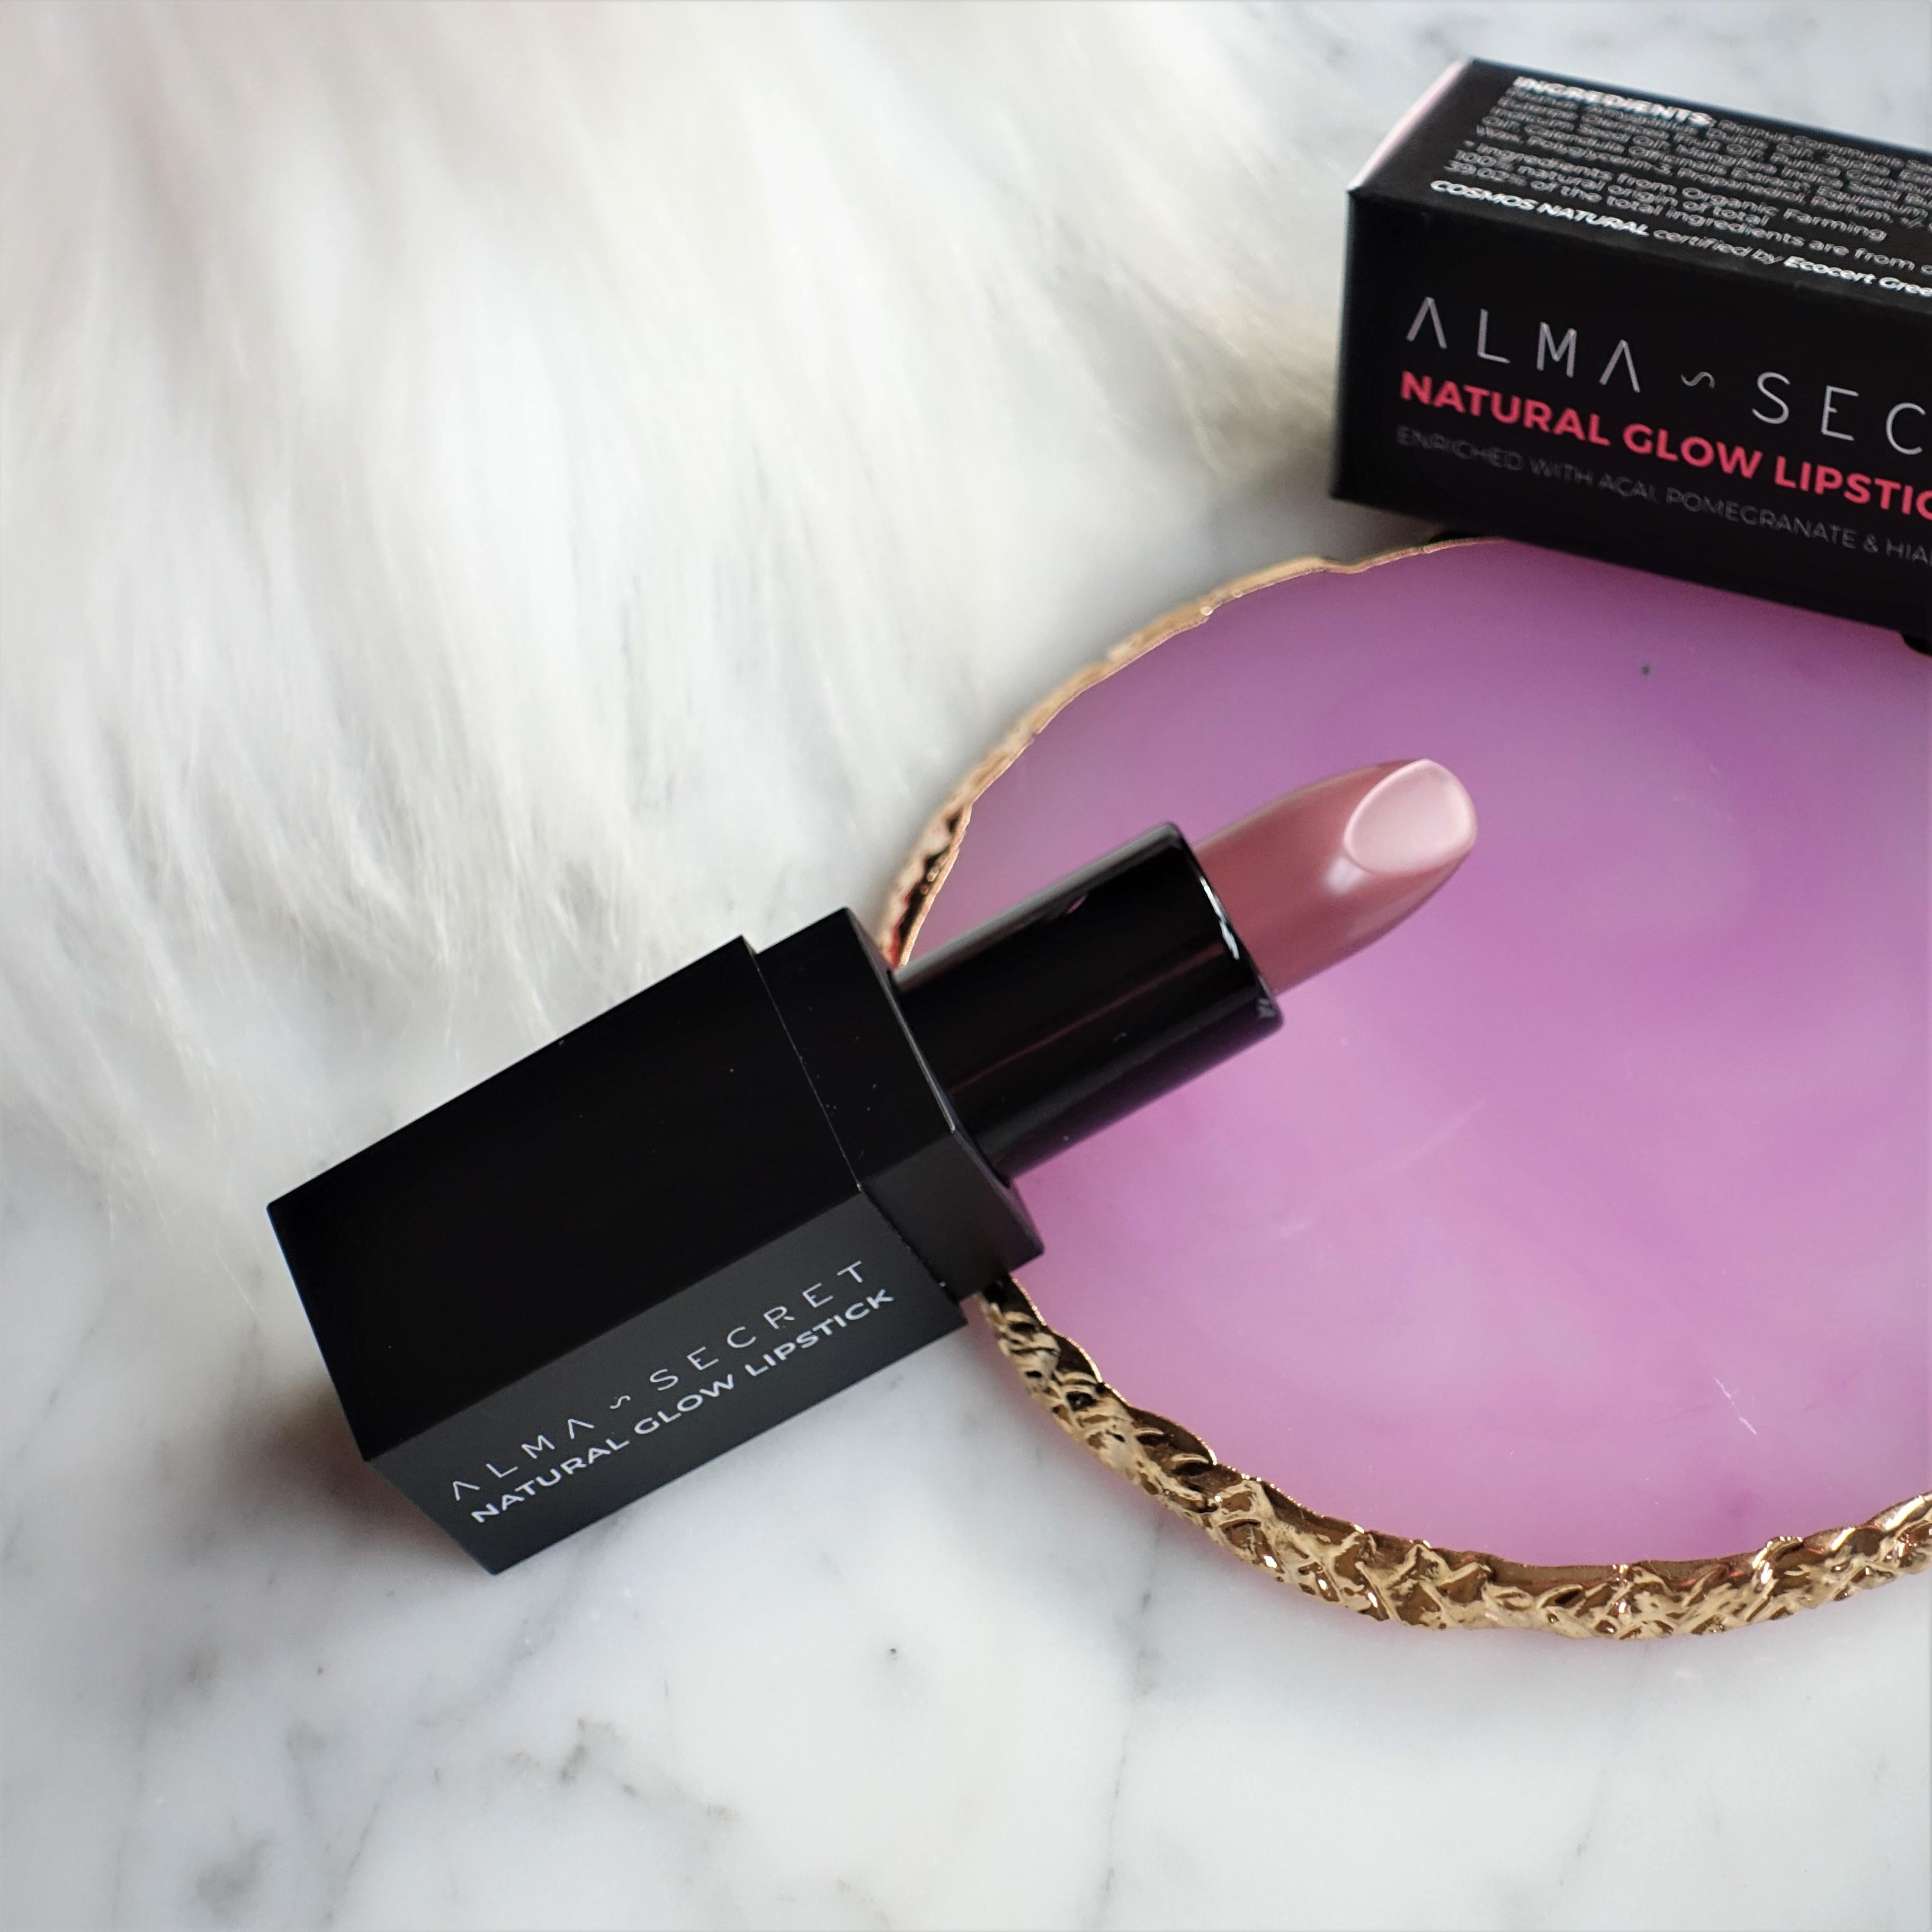 Labiales Natural Glow Lipstick de Alma Secret en 'Plum Chocolat' (Evento #YBB8ED de Girl Power Team)